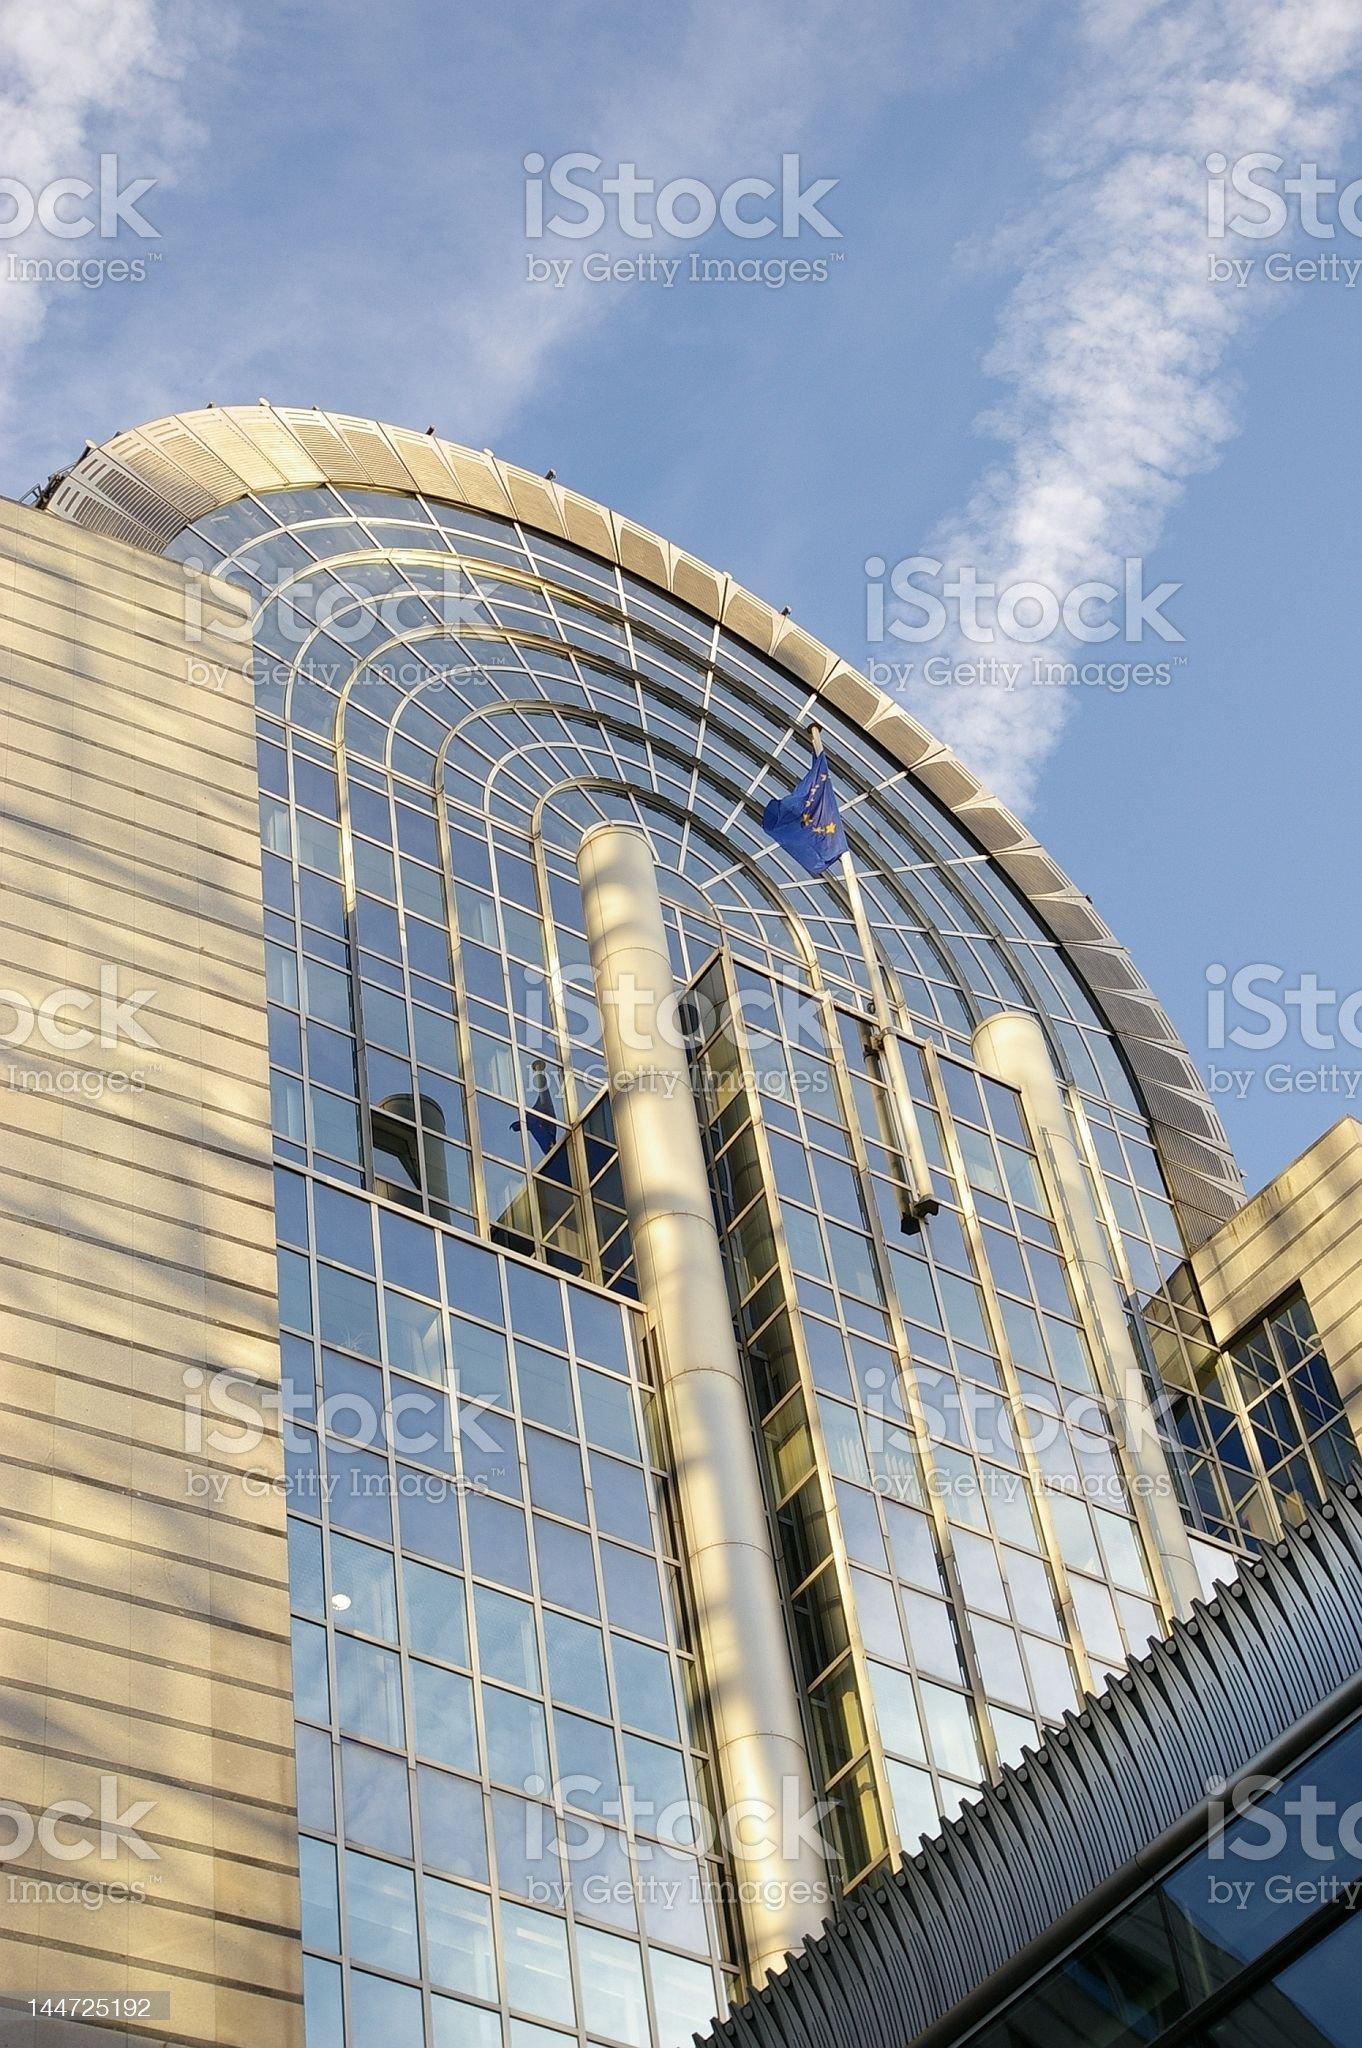 European Parliament building in Brussels, Belgium royalty-free stock photo